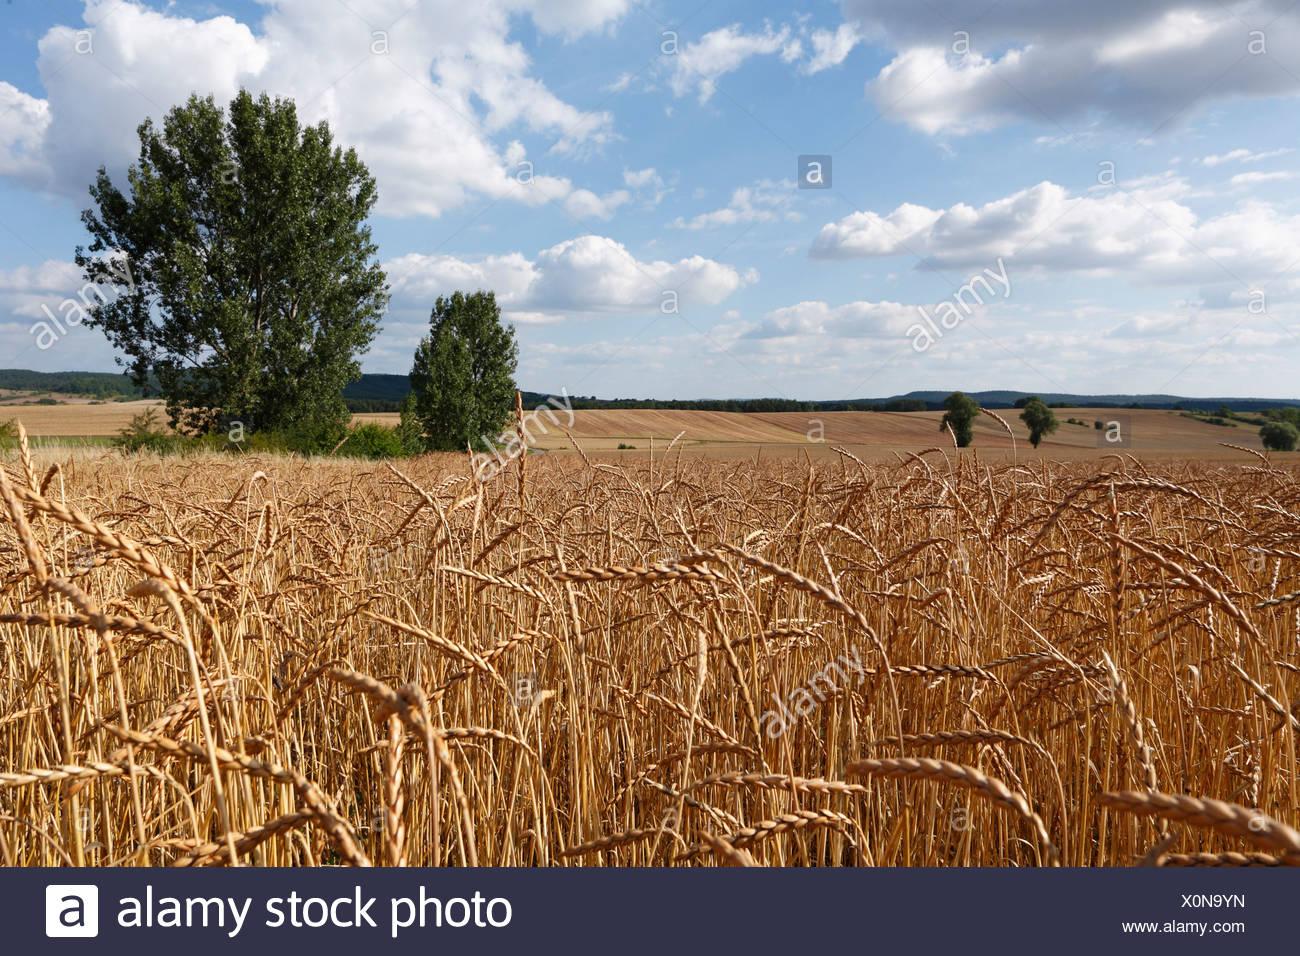 Wheat field near Alsleben, Trappstadt district, Rhoen-Grabfeld, Hass Mountains, Lower Franconia, Germany, Europe - Stock Image